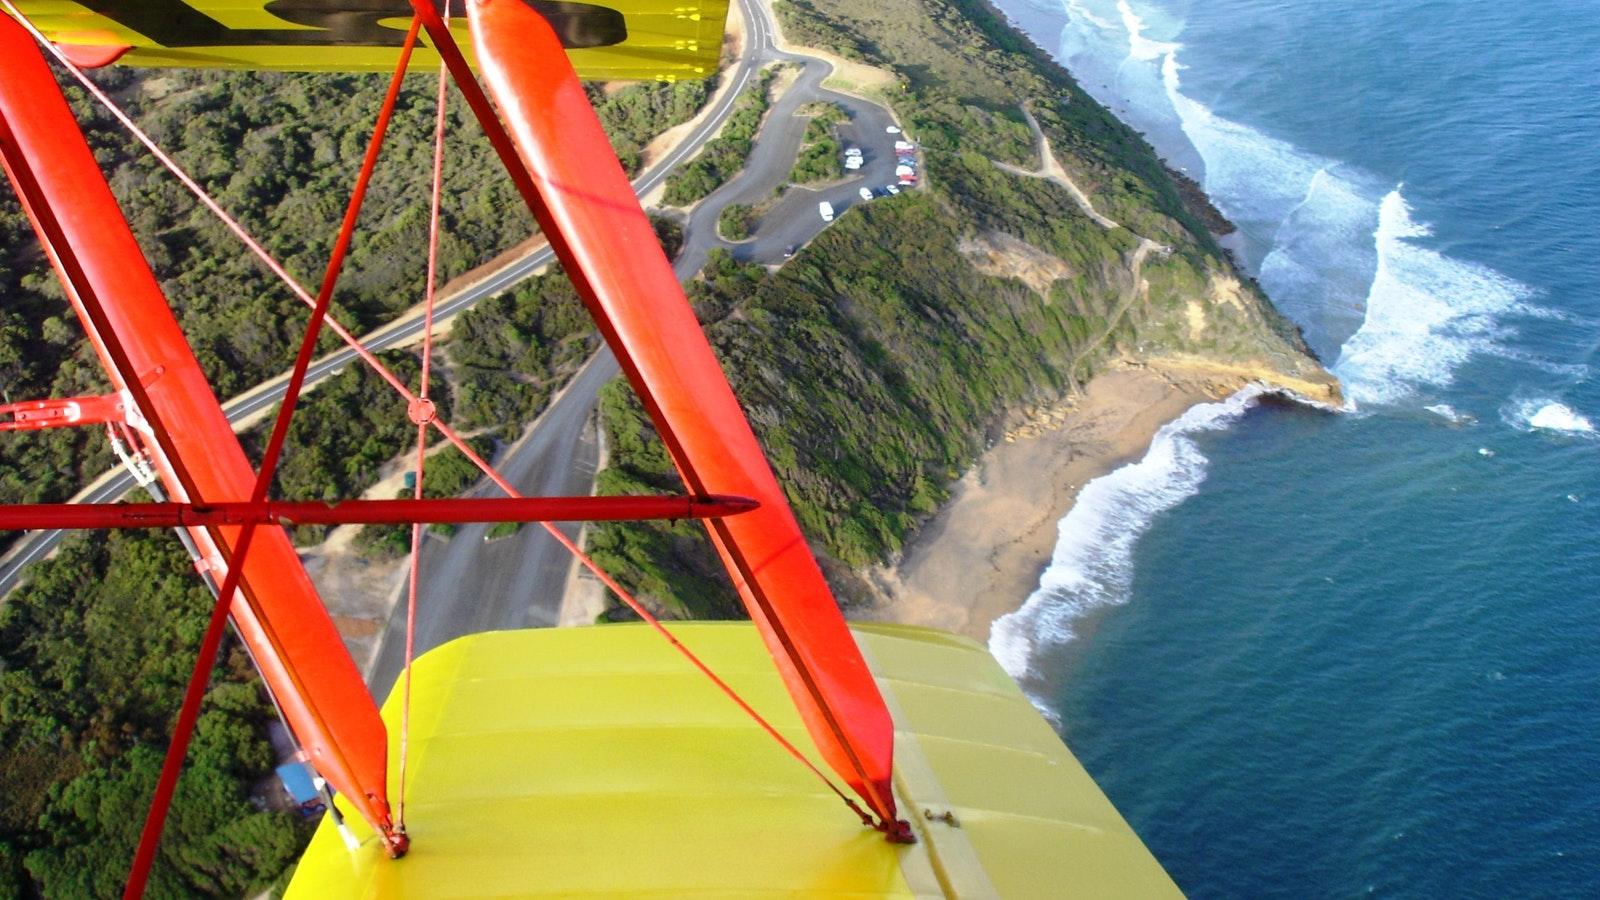 Tiger Moth World flight over Torquay coast